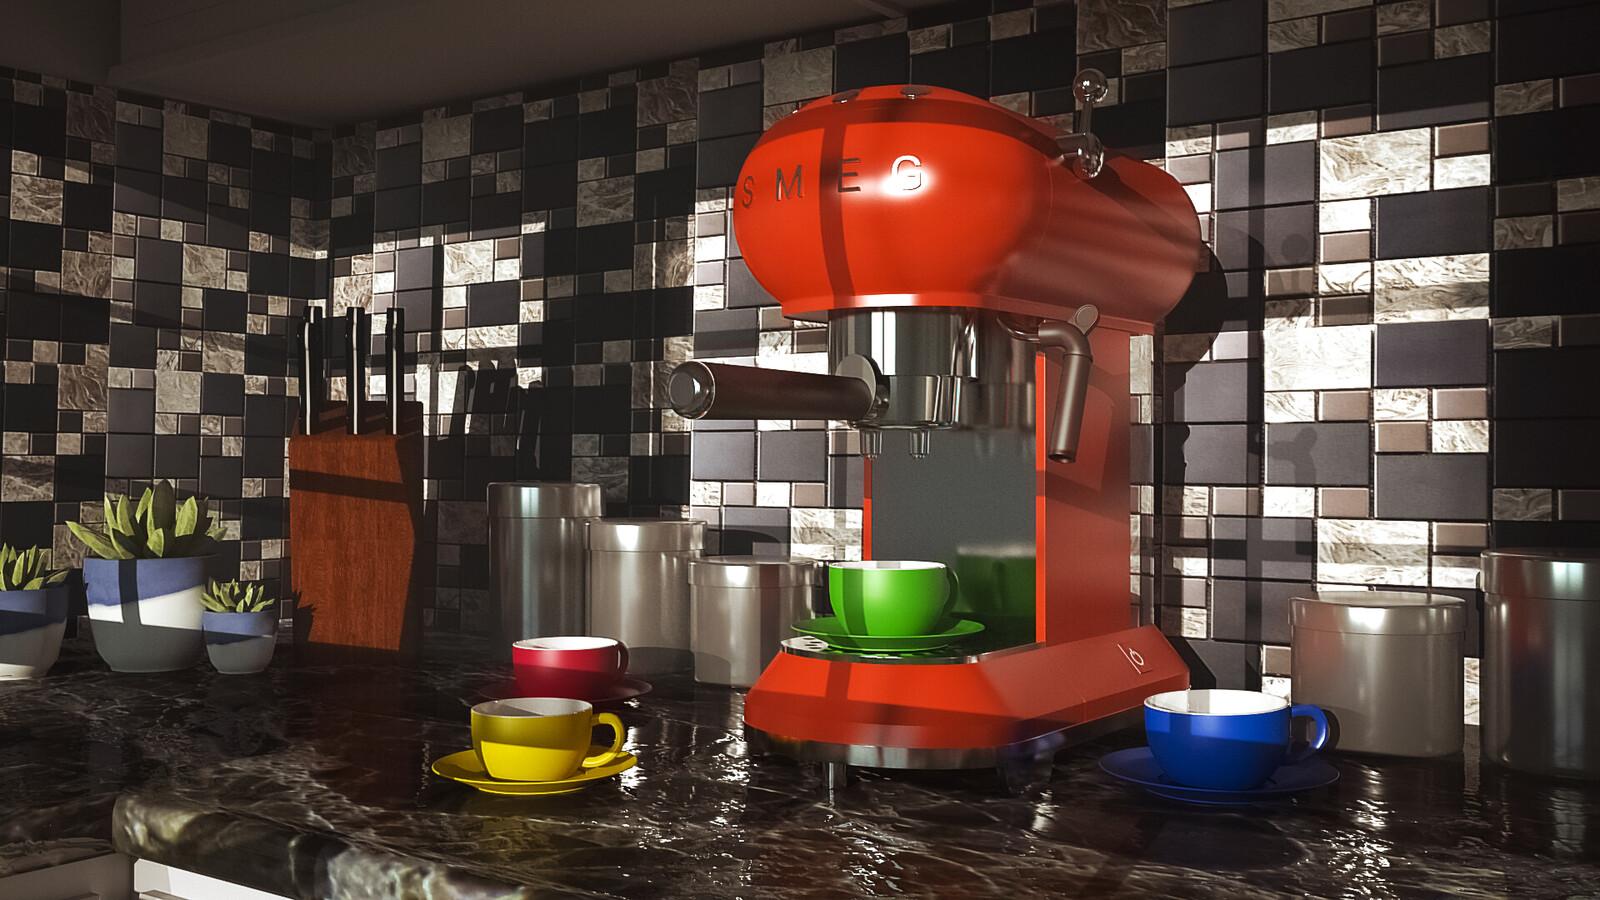 SMEG Cappuccino Machine